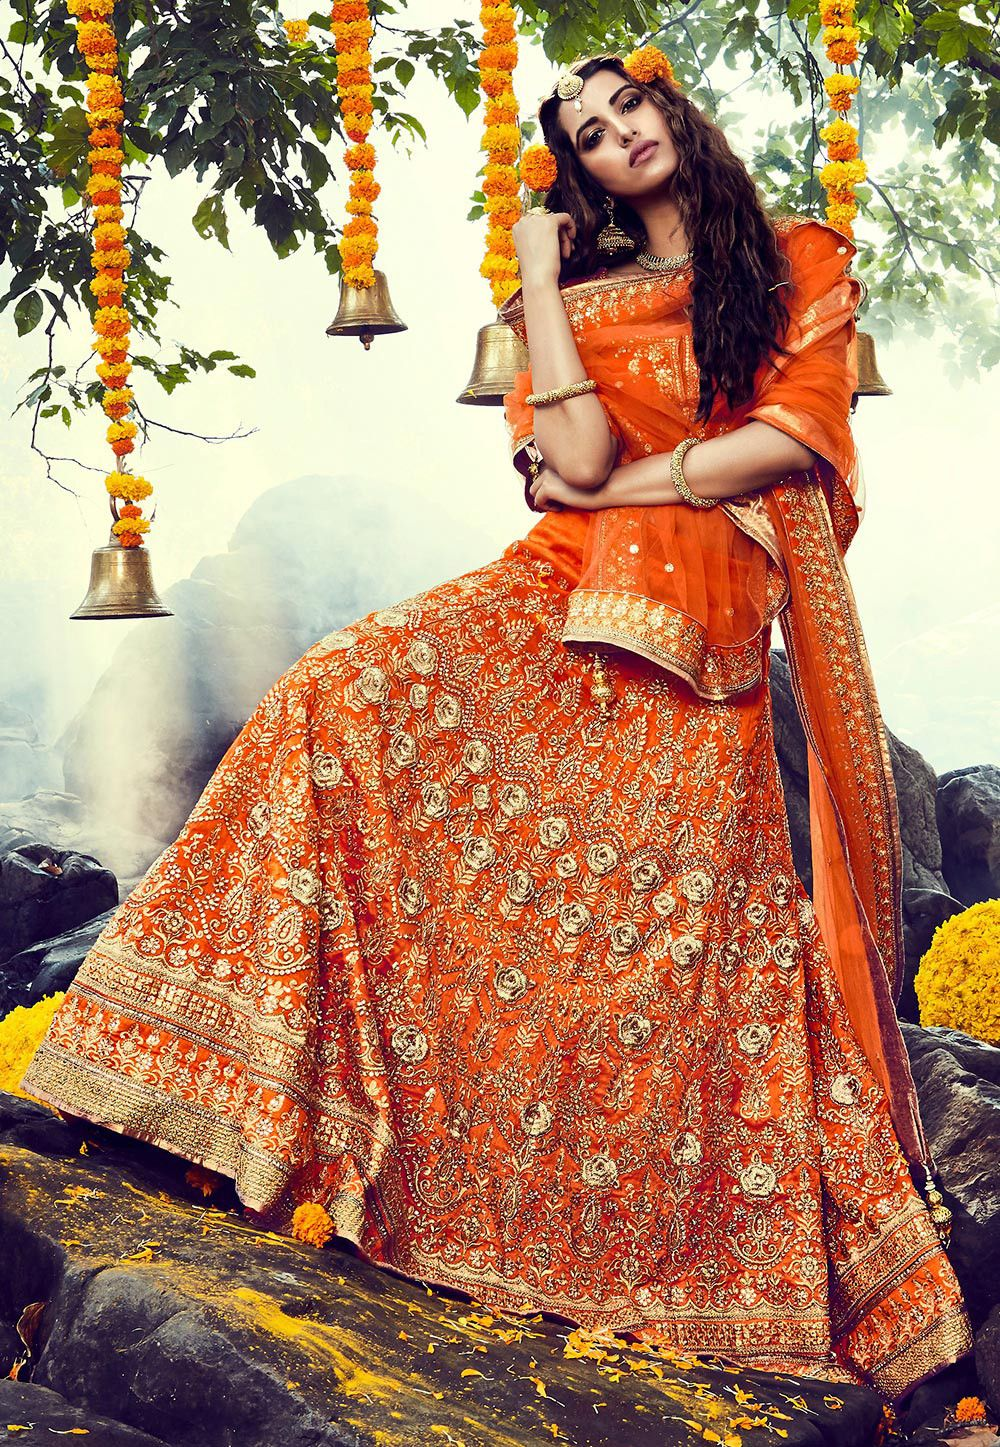 This circular lehenga in bhagalpuri silk is an orange masterpiece